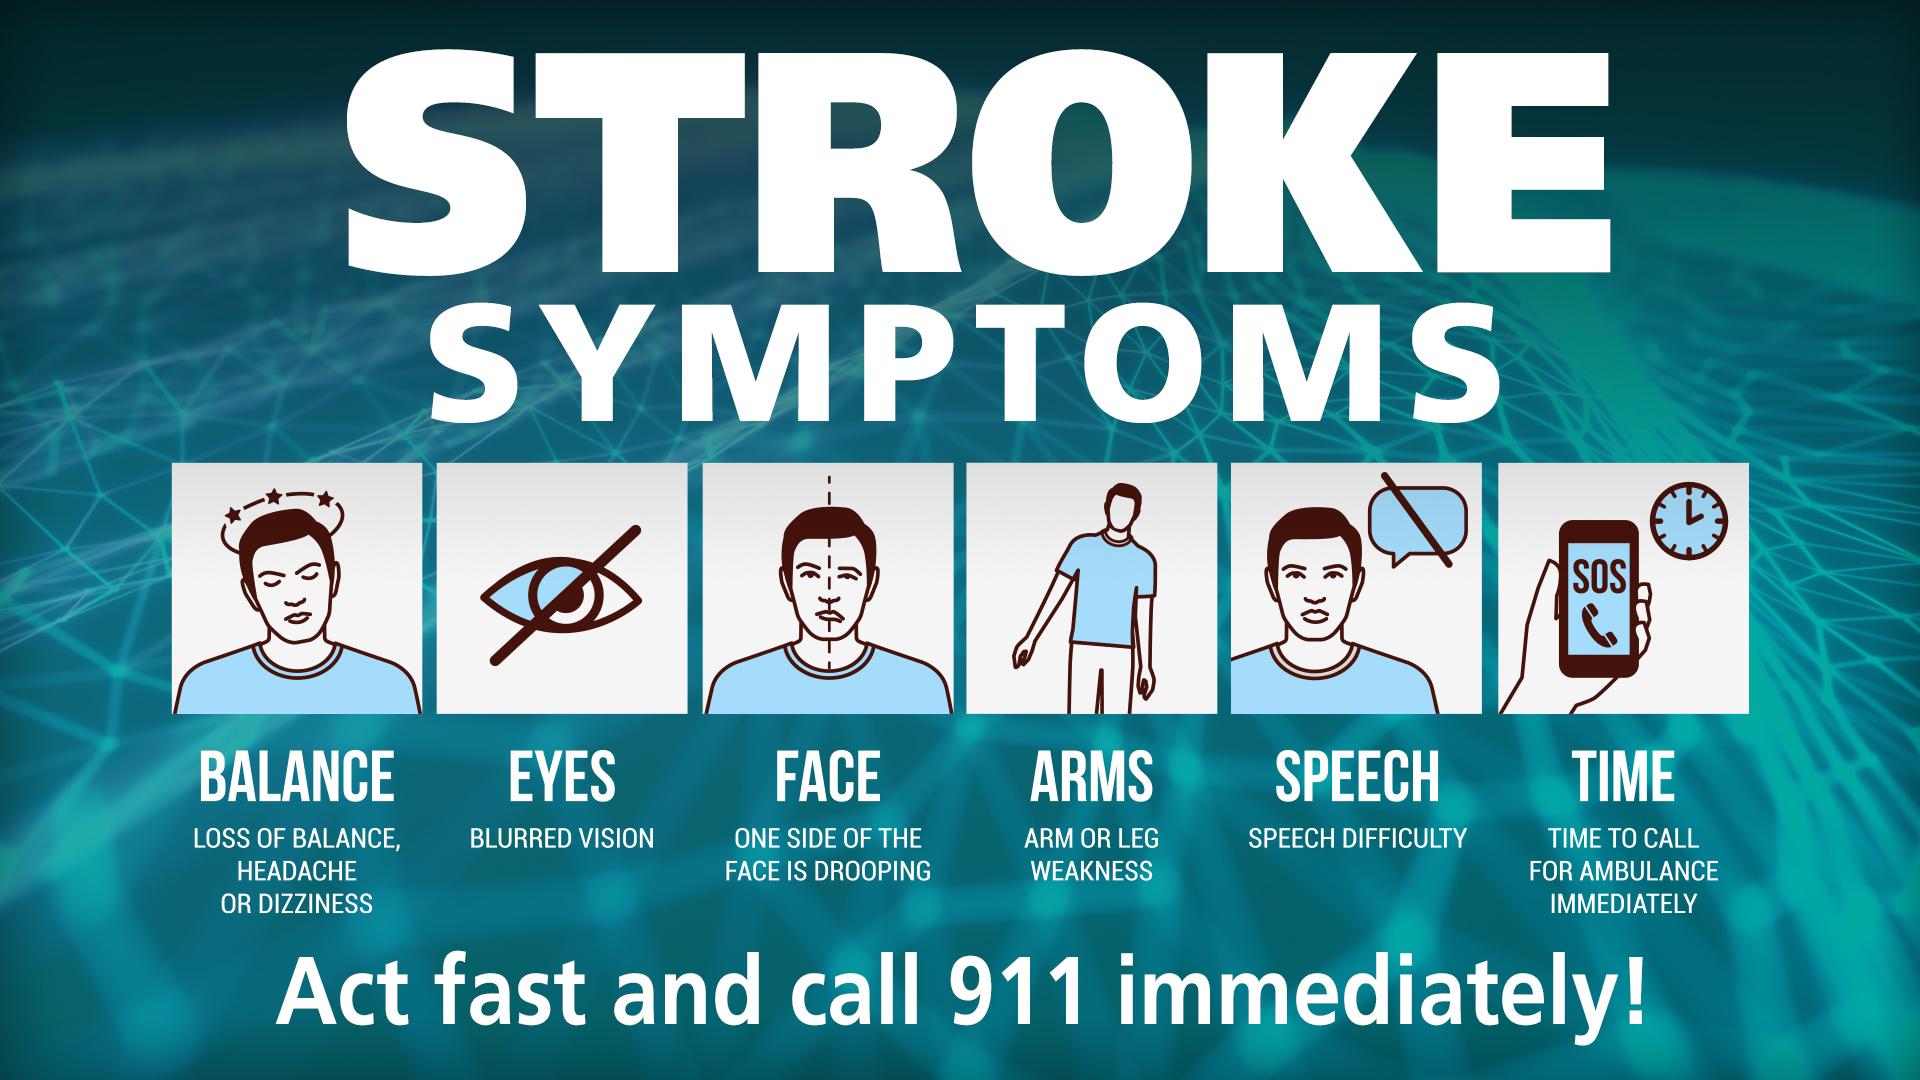 ED_StrokeSymptoms_1920x1080_4_18_1